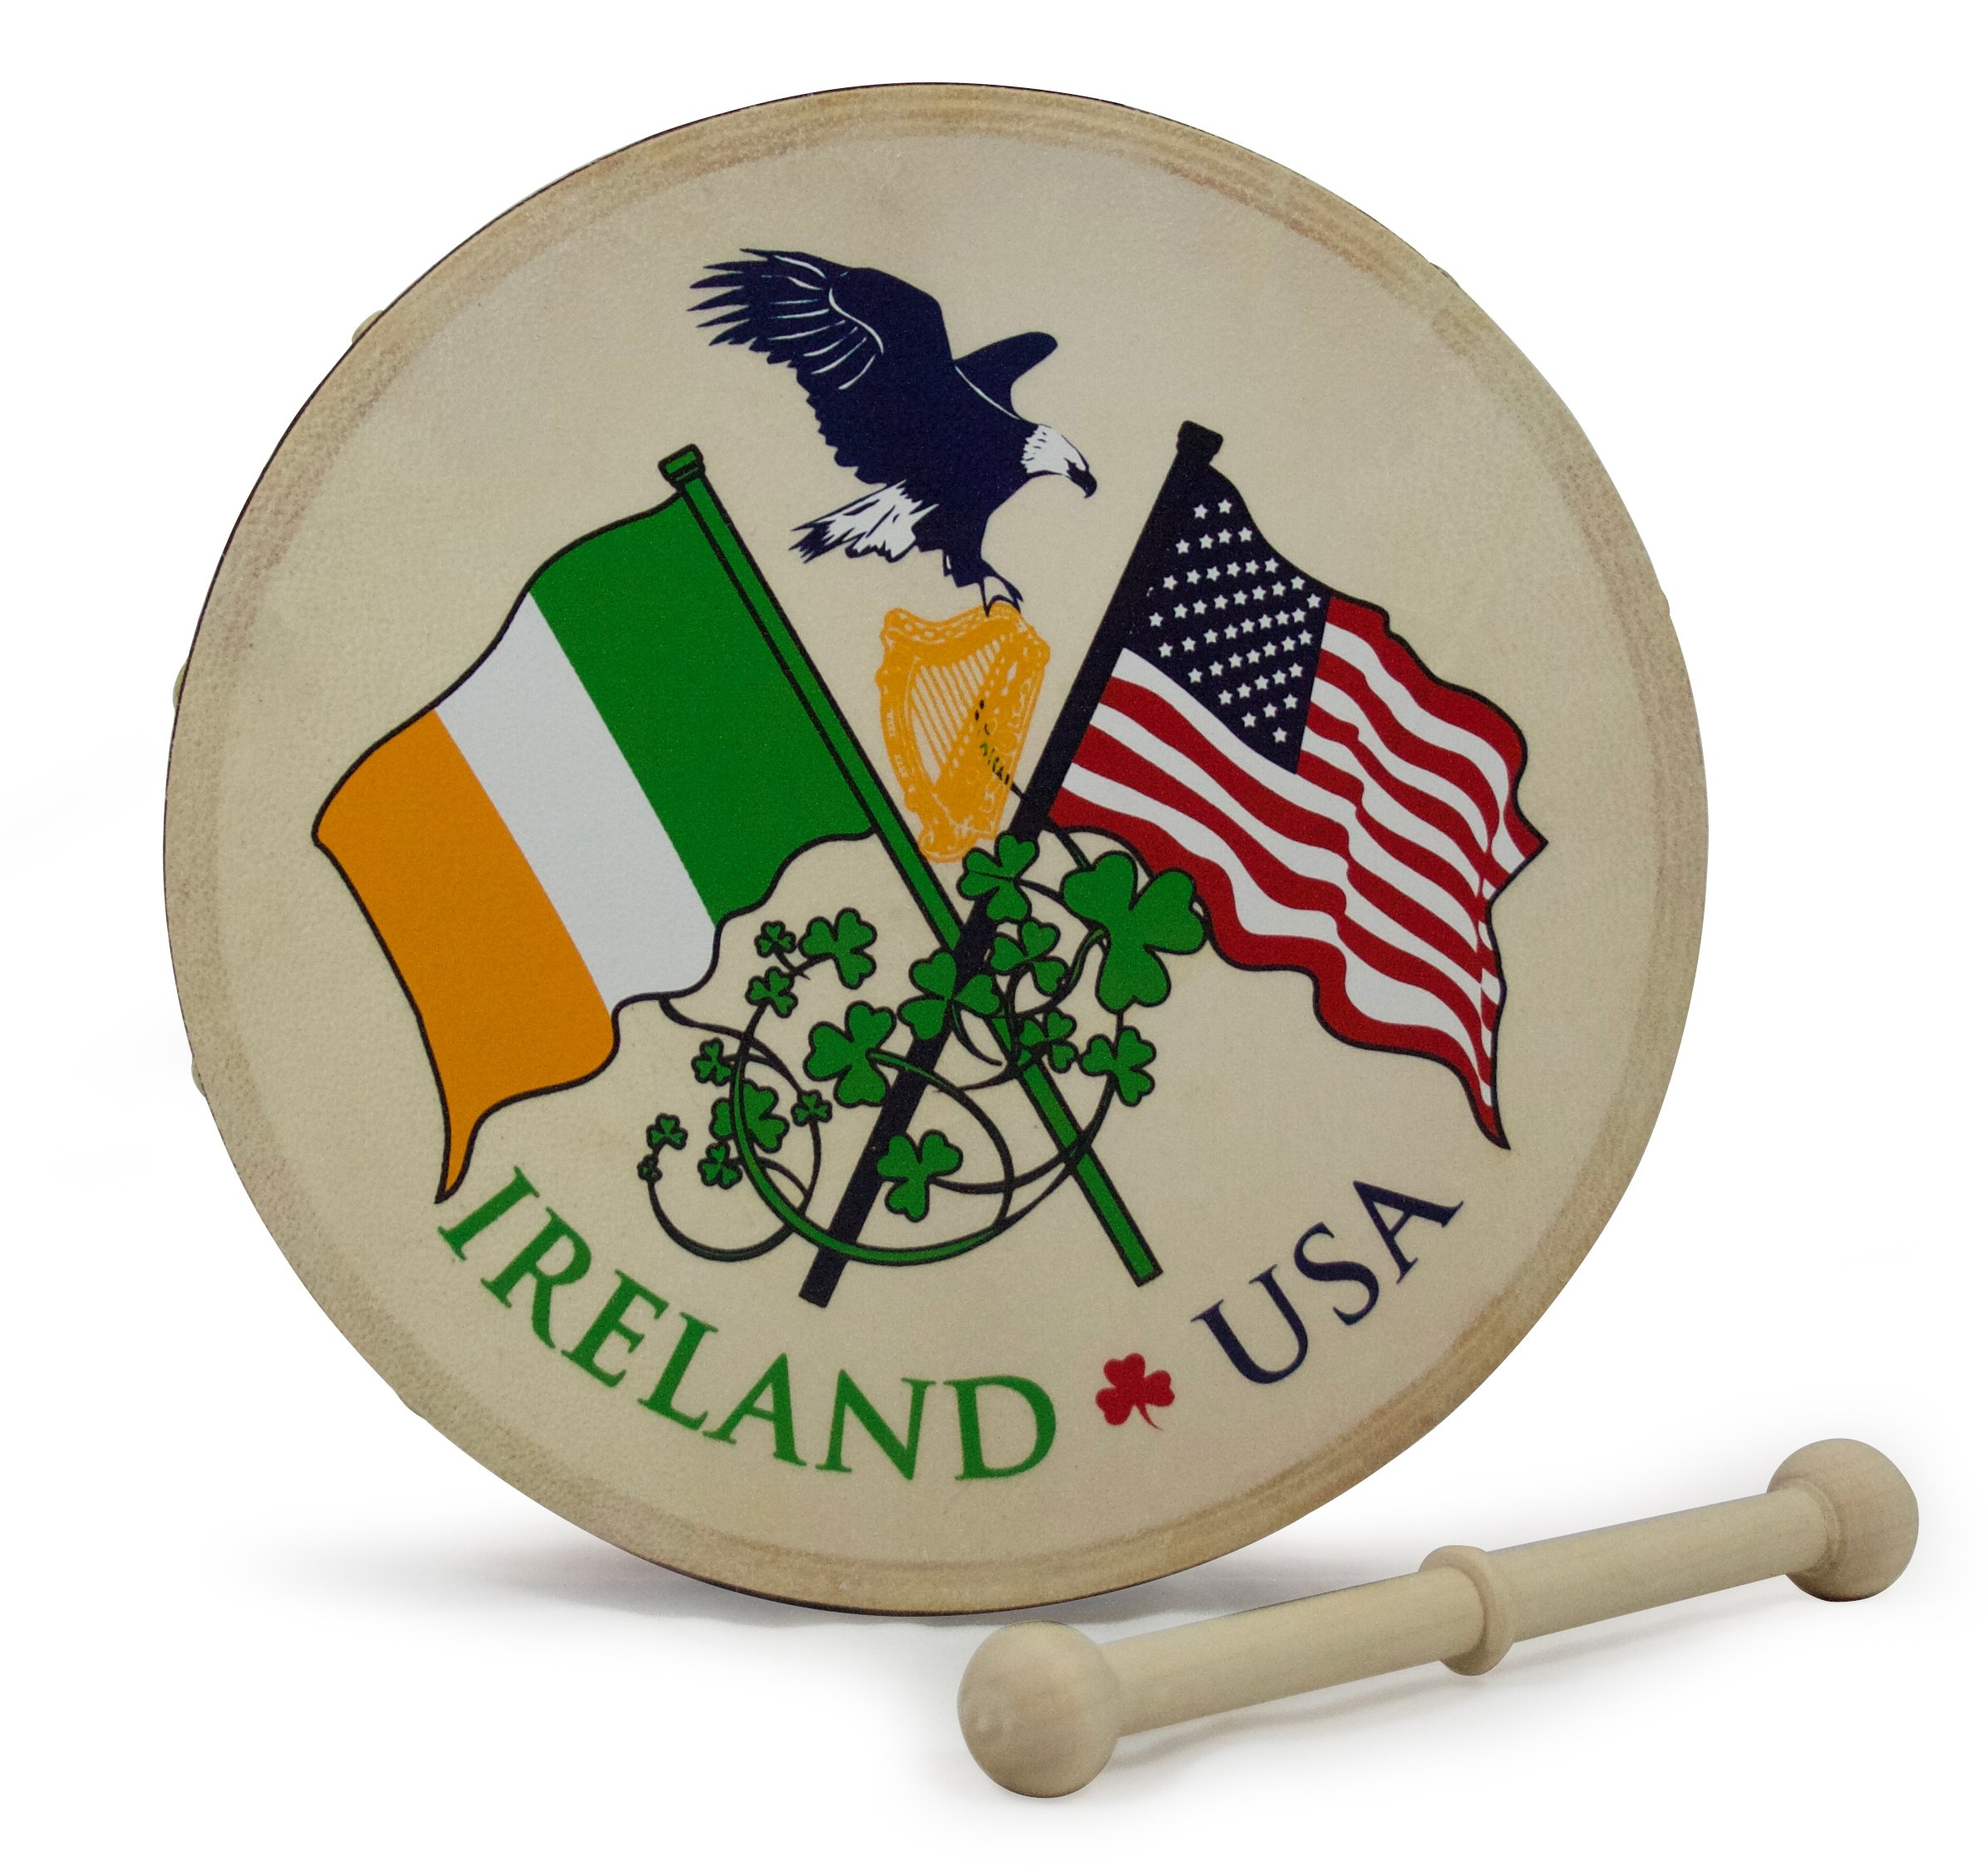 Waltons 8 Inch USA IRELAND Bodhrán - Handcrafted Irish Instrument - Crisp & Musical Tone - Hardwood Beater Included w/Purchase